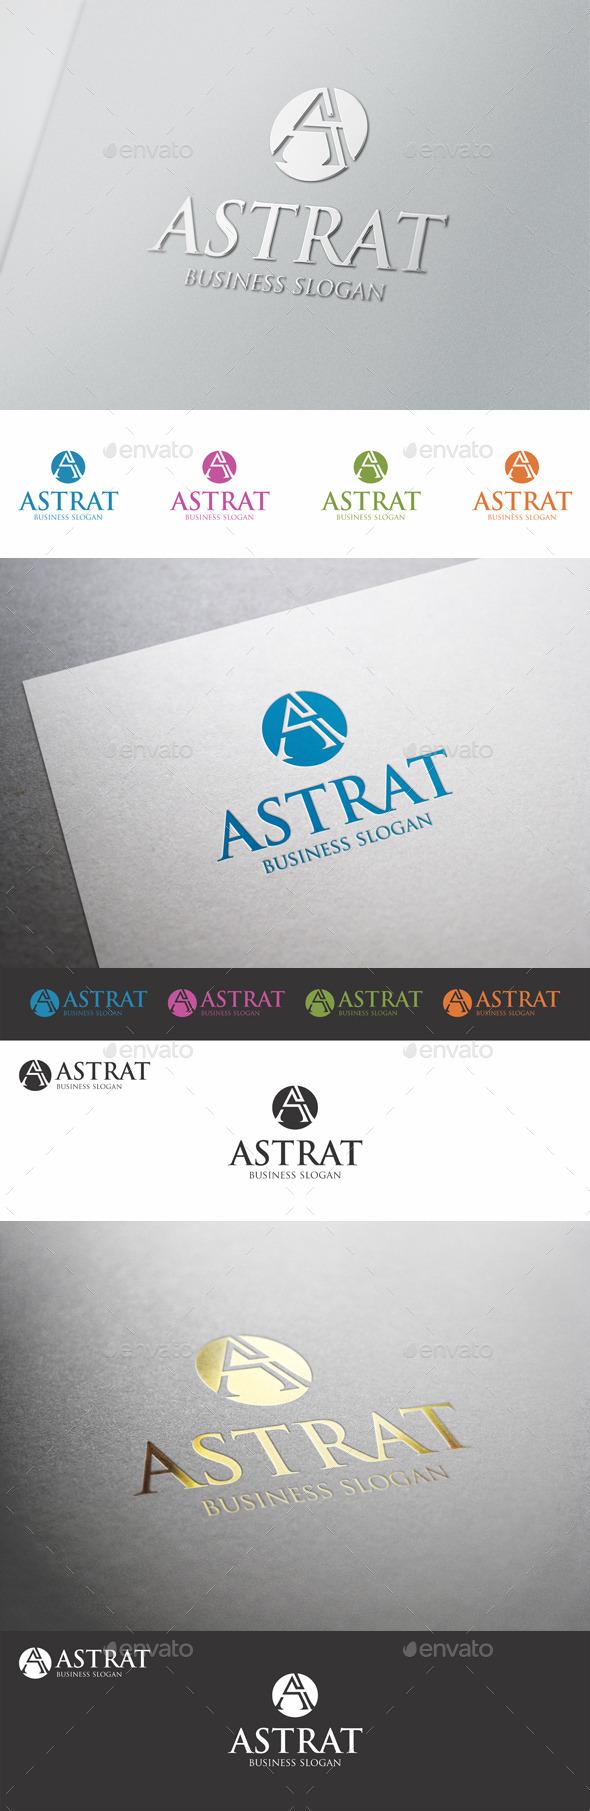 A Creative Logo Letter - Astrat